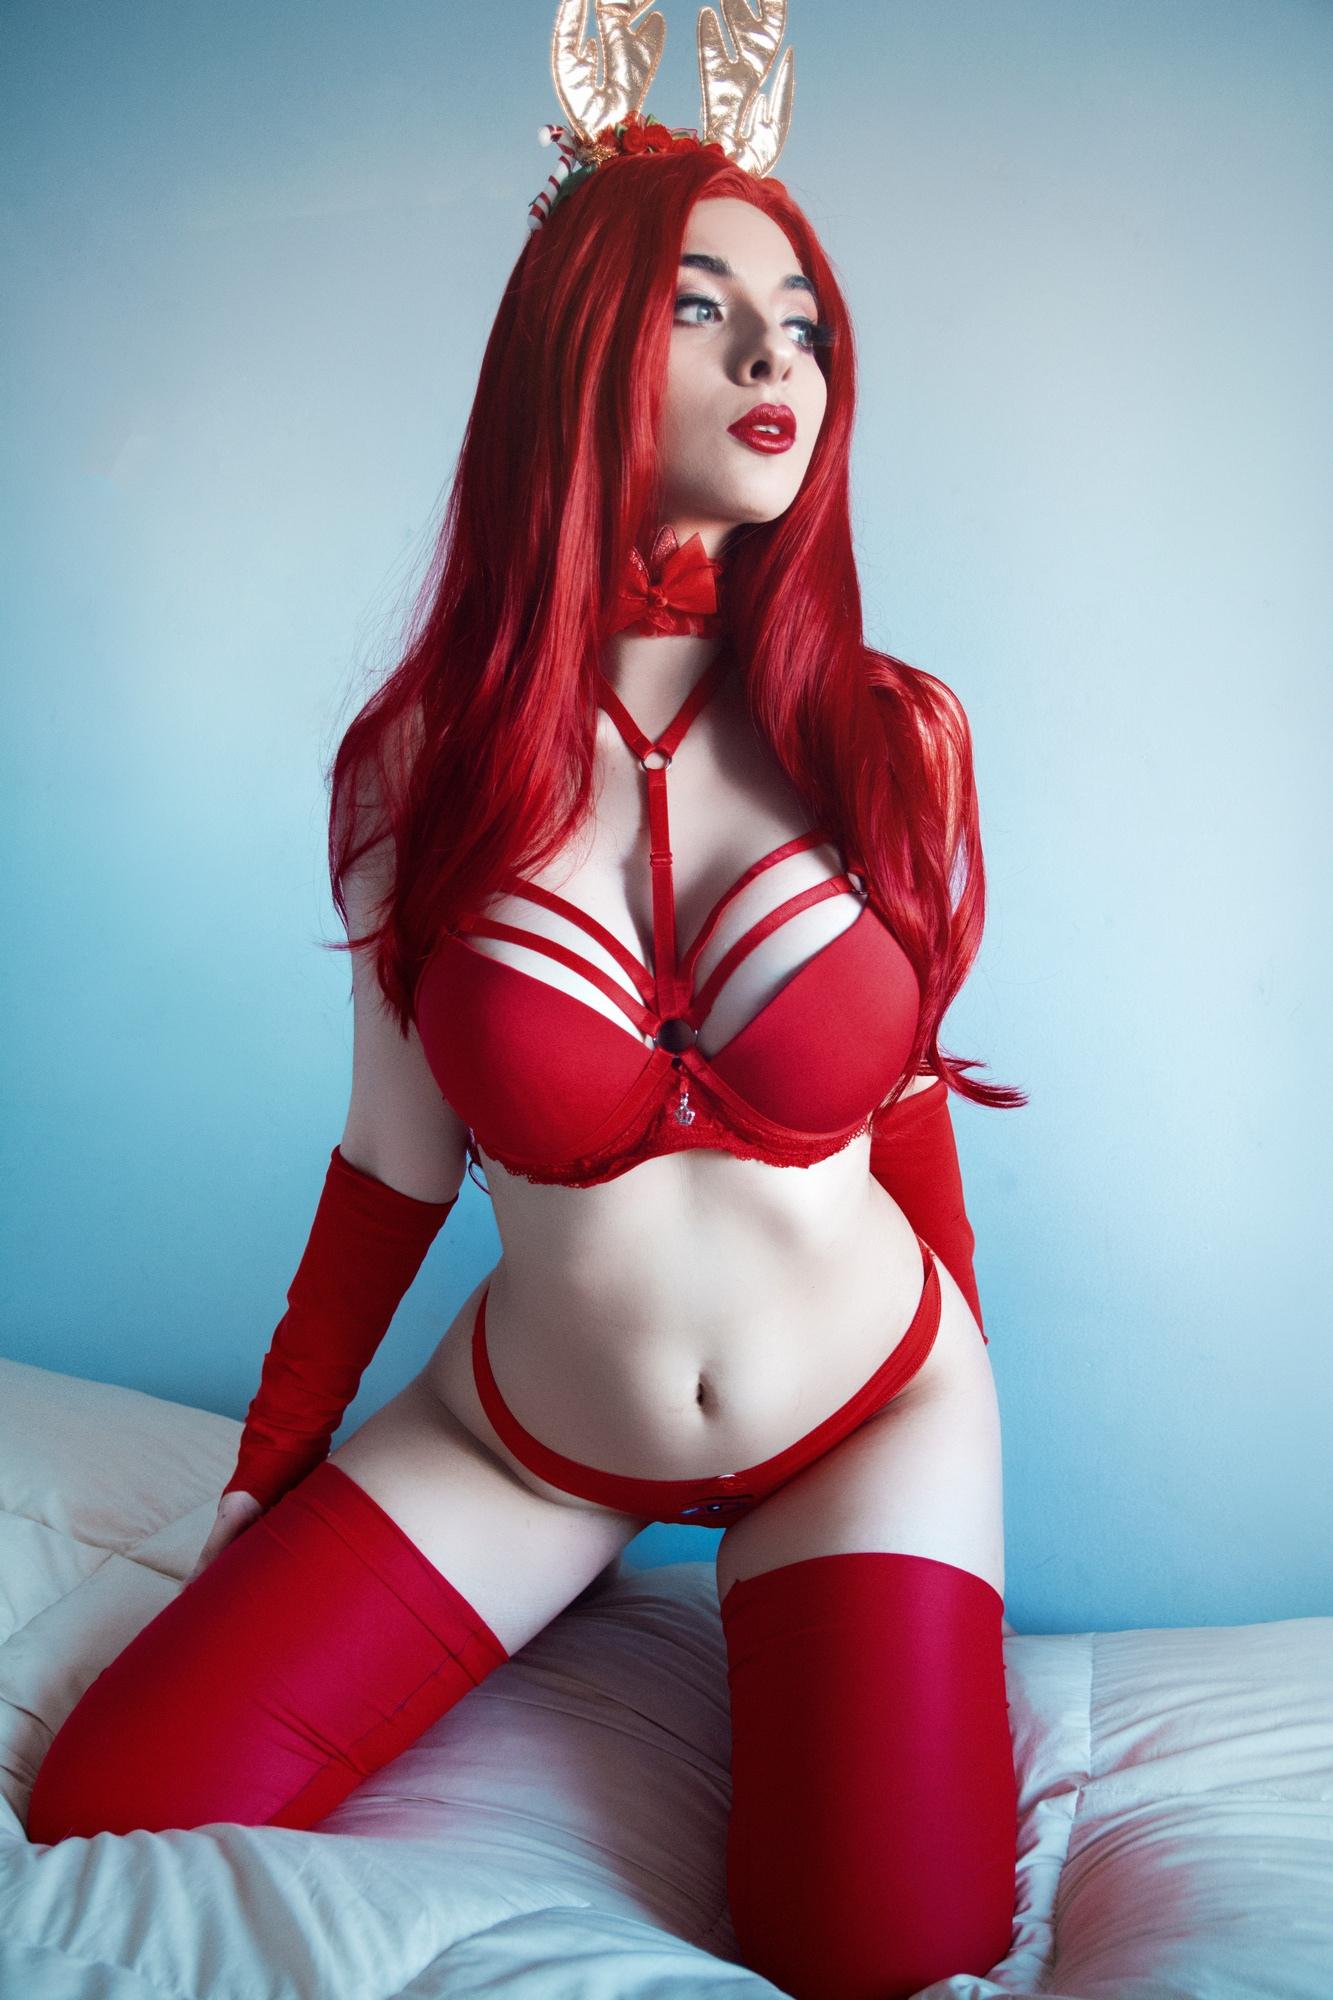 Valentina Kryp cosplay set